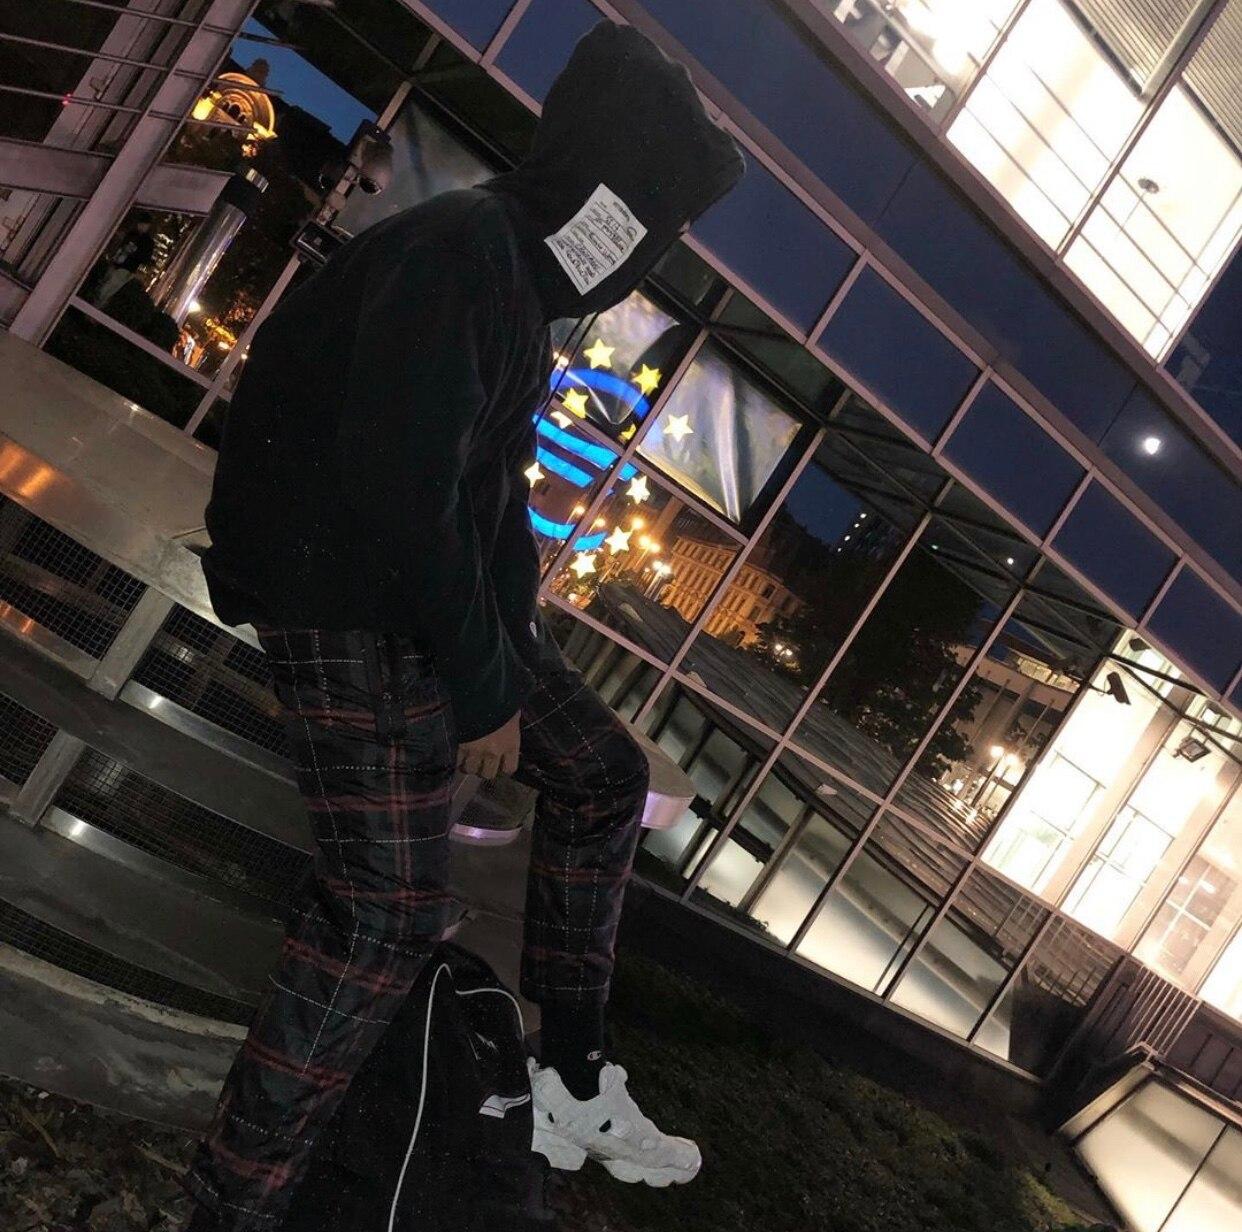 2020 Vetements Hoodies Oversize Cotton 1:1 High Quality Fasion Vetements Sweatshirts Men Women Streetwear Hip Hop Pullovers